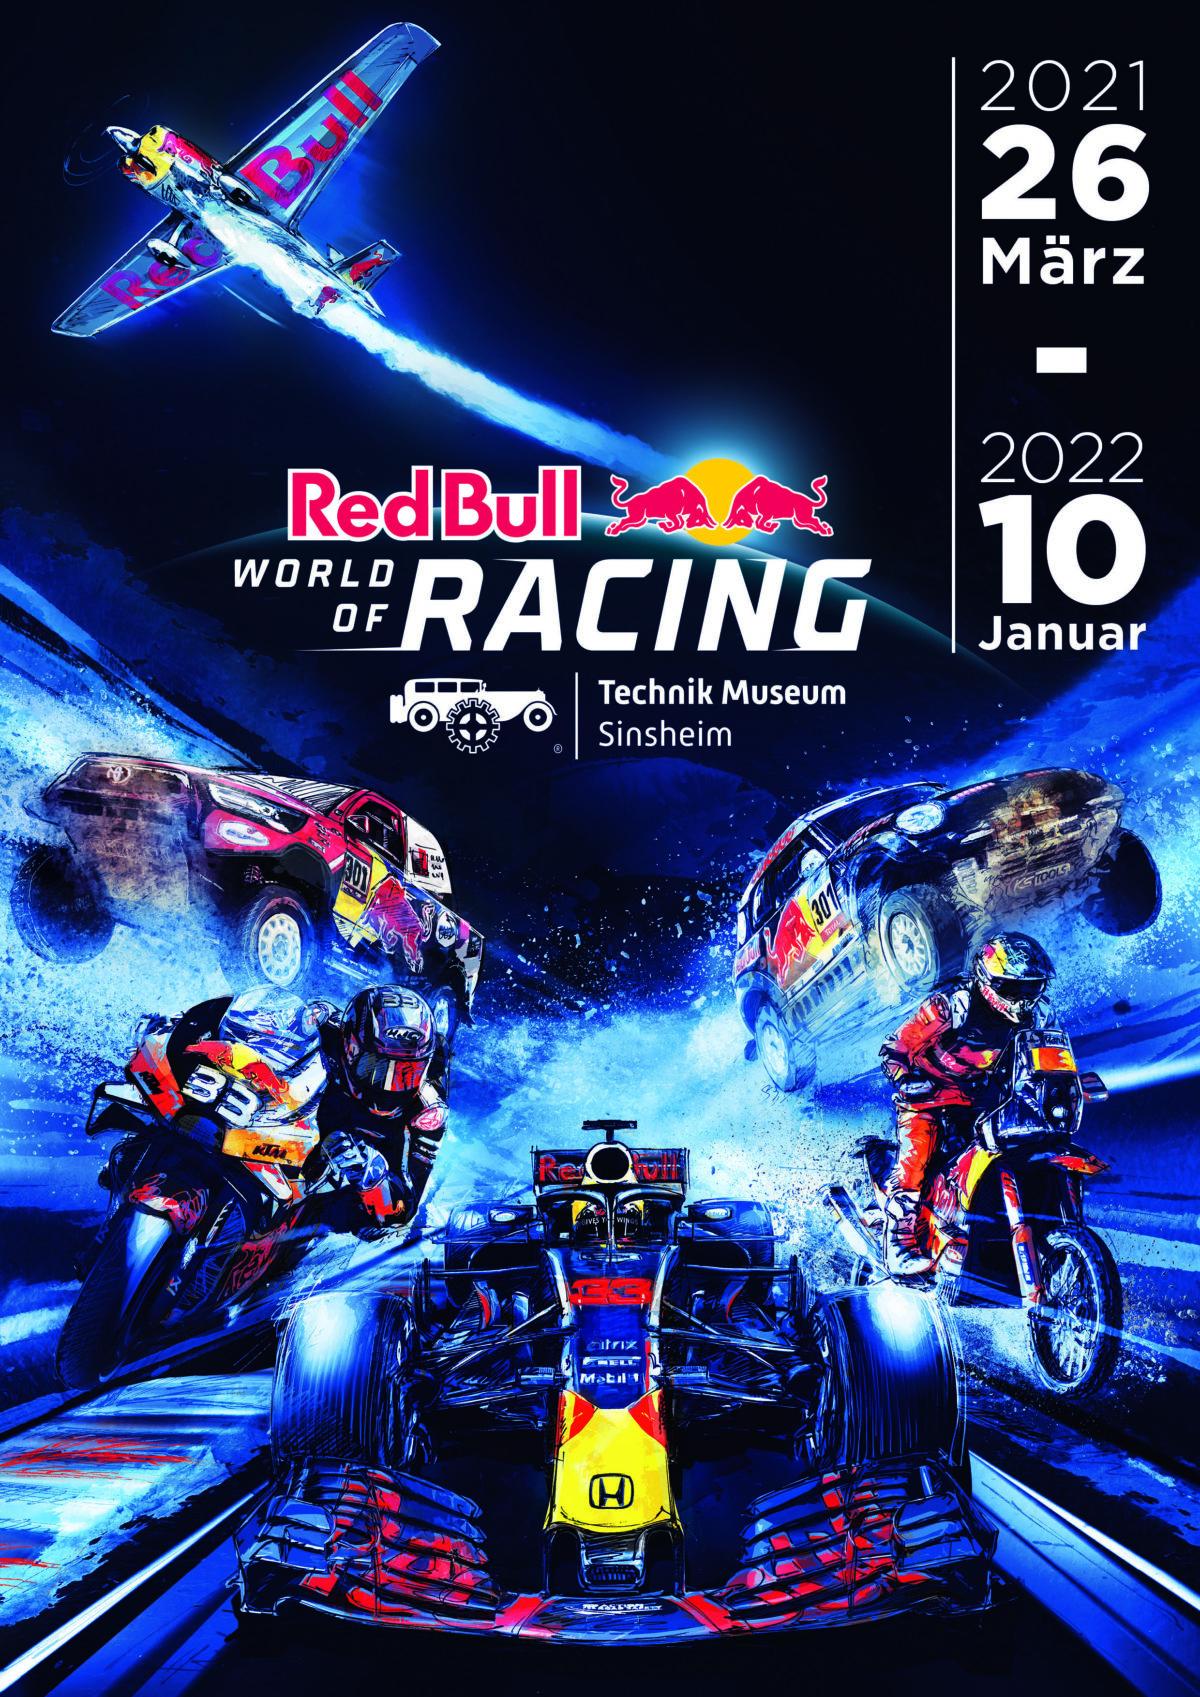 Red Bull World of Racing